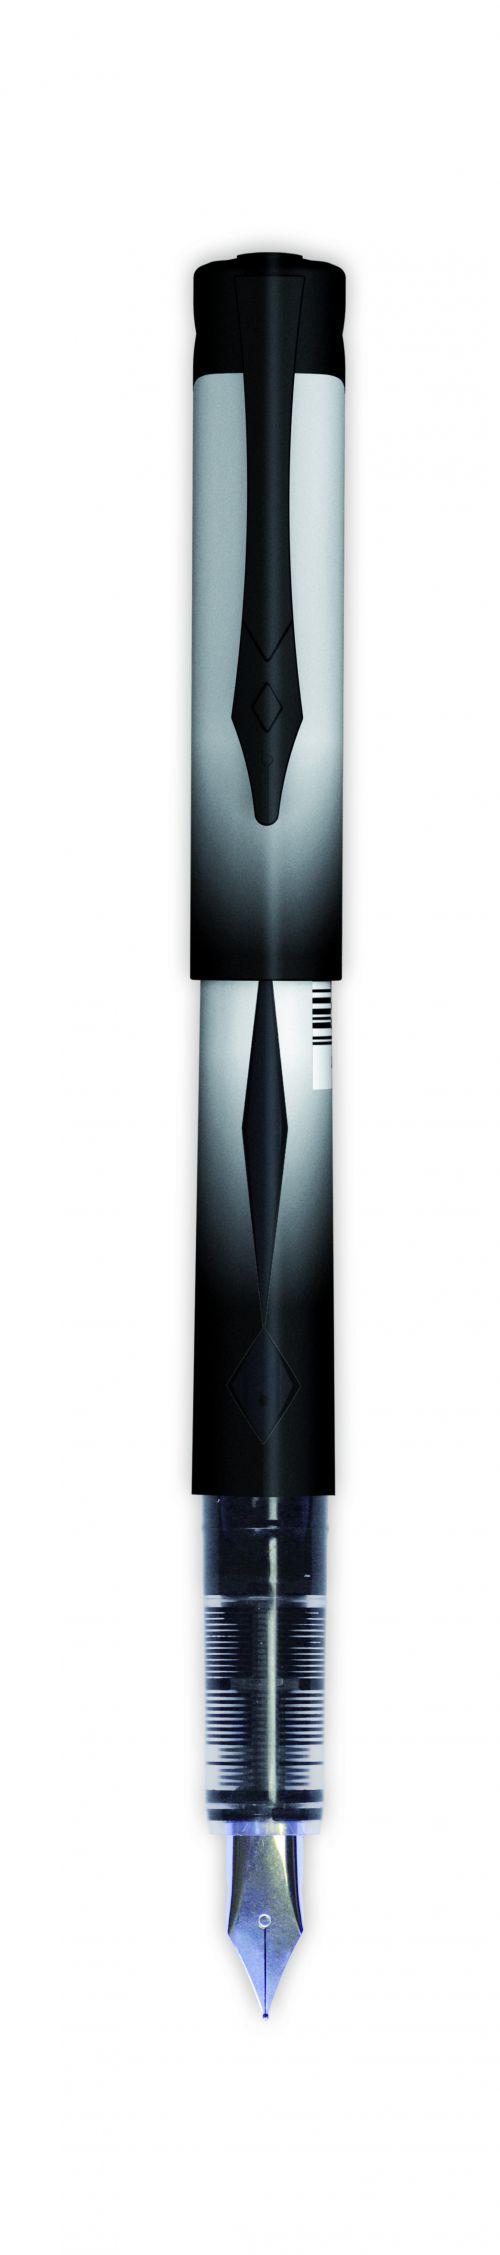 Snopake Platignum Fountain Pen Black (Pack of 12) 50460